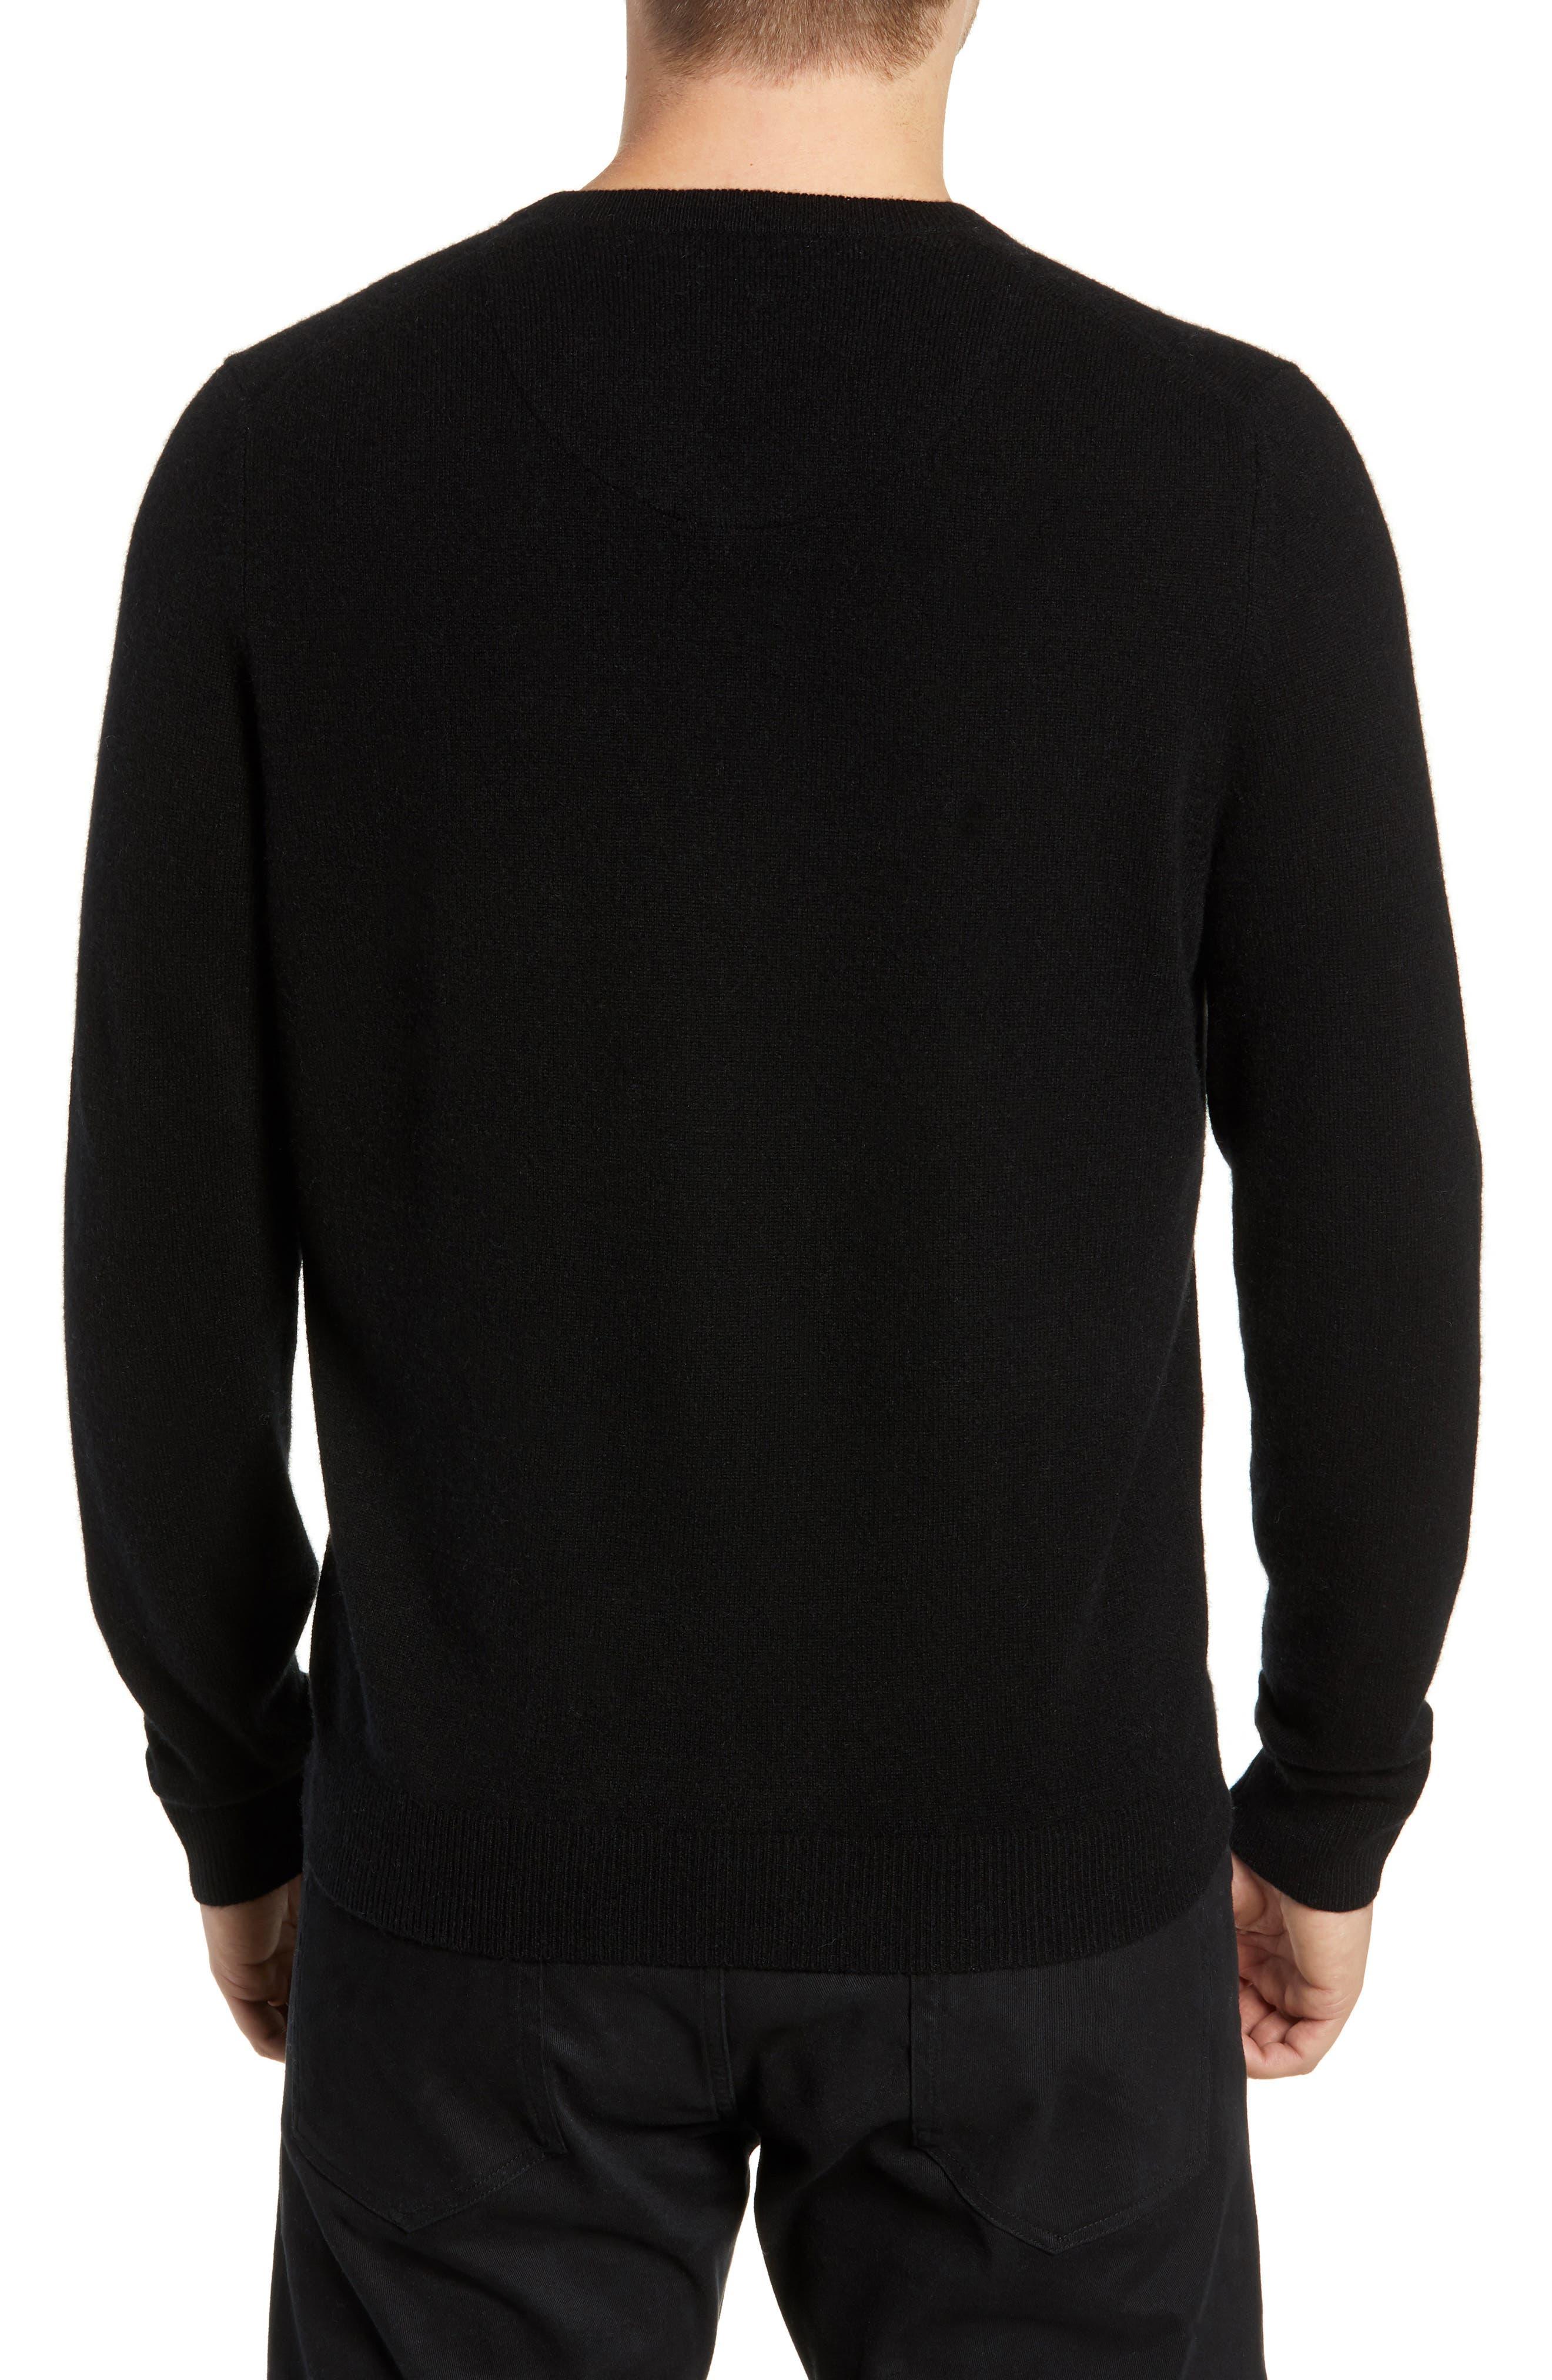 Cashmere V-Neck Sweater,                             Alternate thumbnail 2, color,                             BLACK CAVIAR